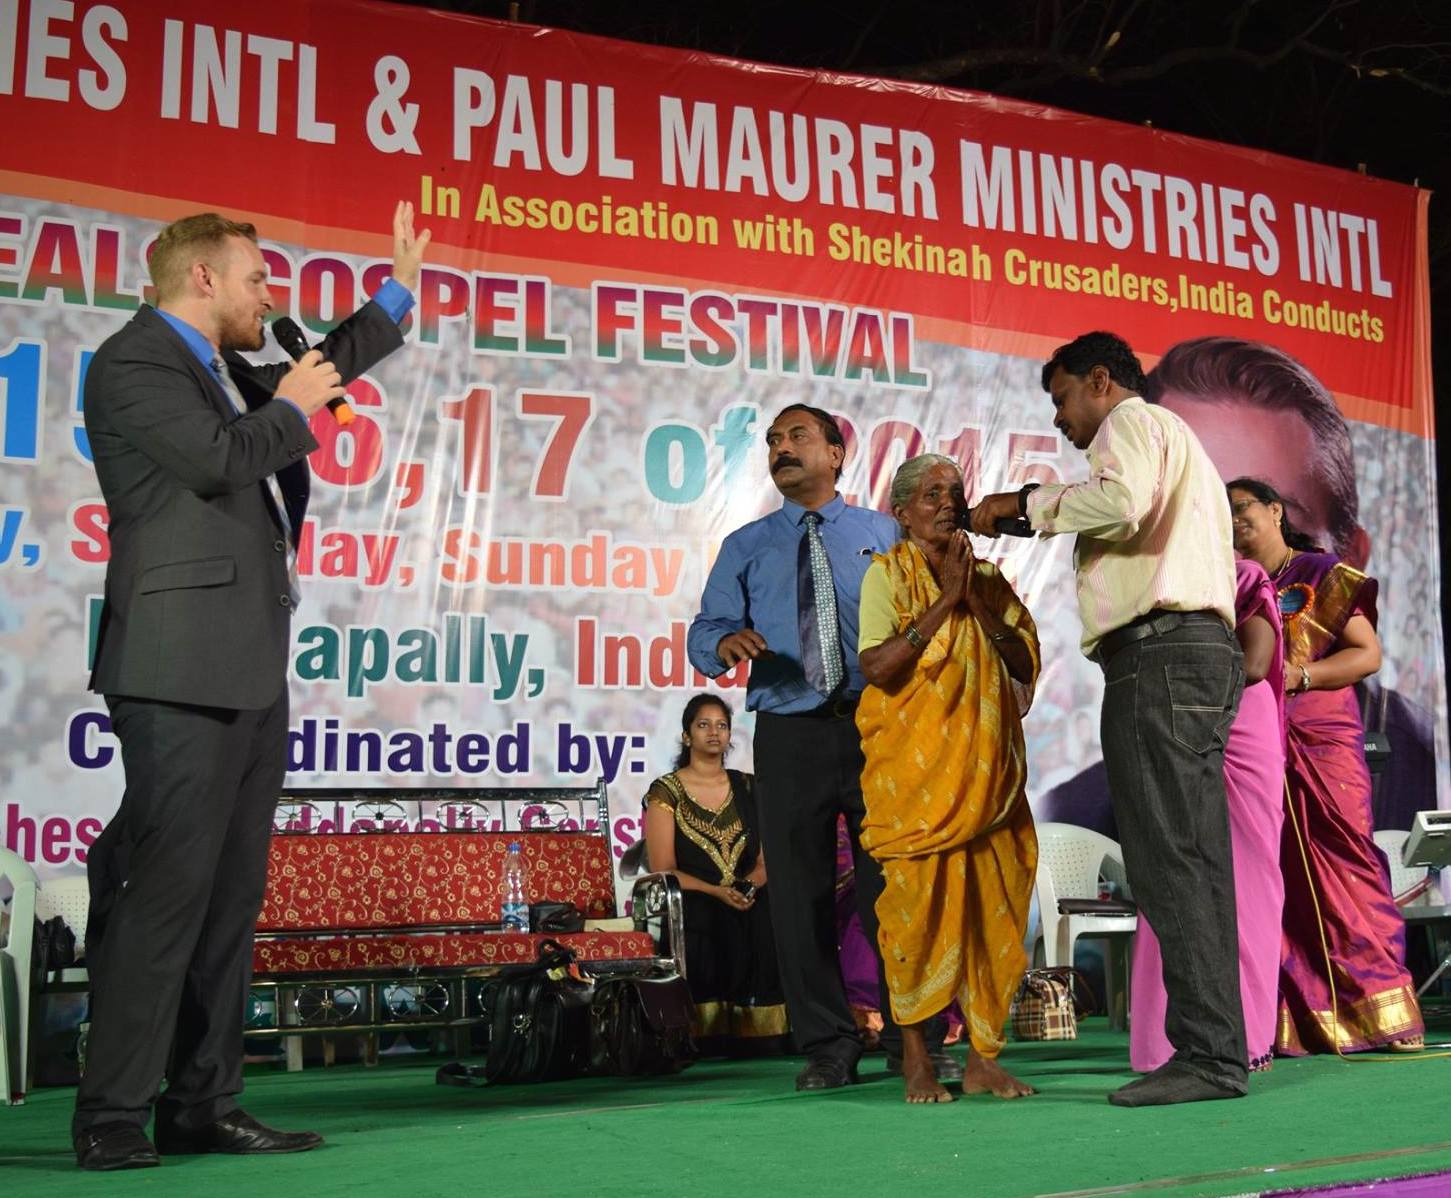 Jesus restored this deaf woman's hearing!